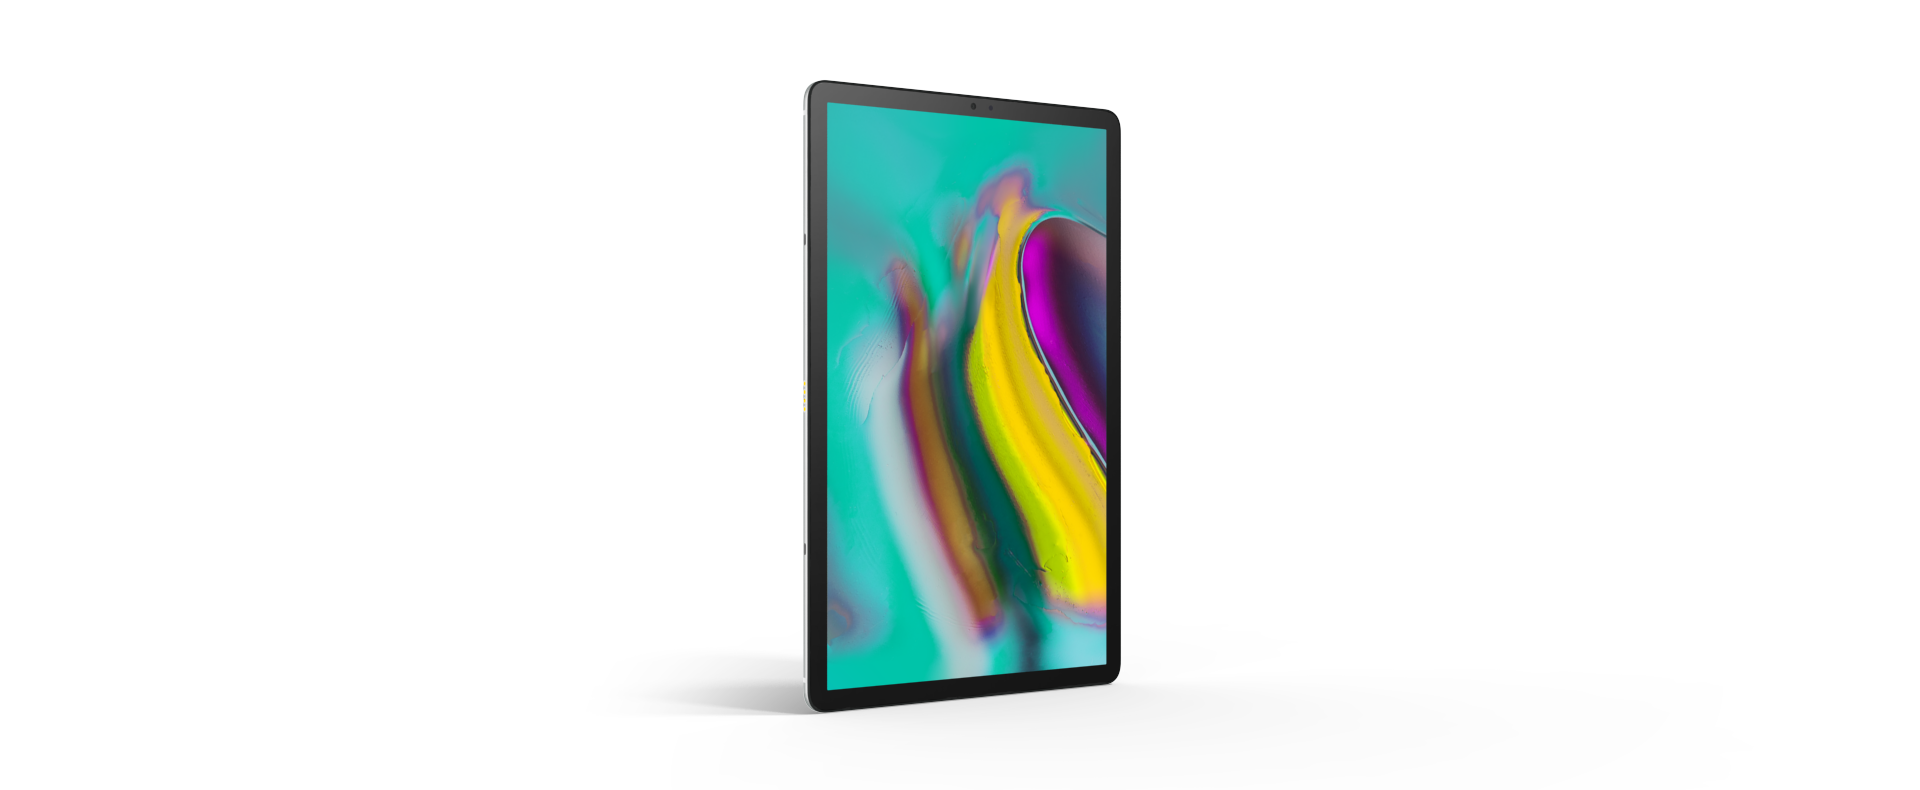 Samsung Galaxy Tab S5e with 6GB RAM